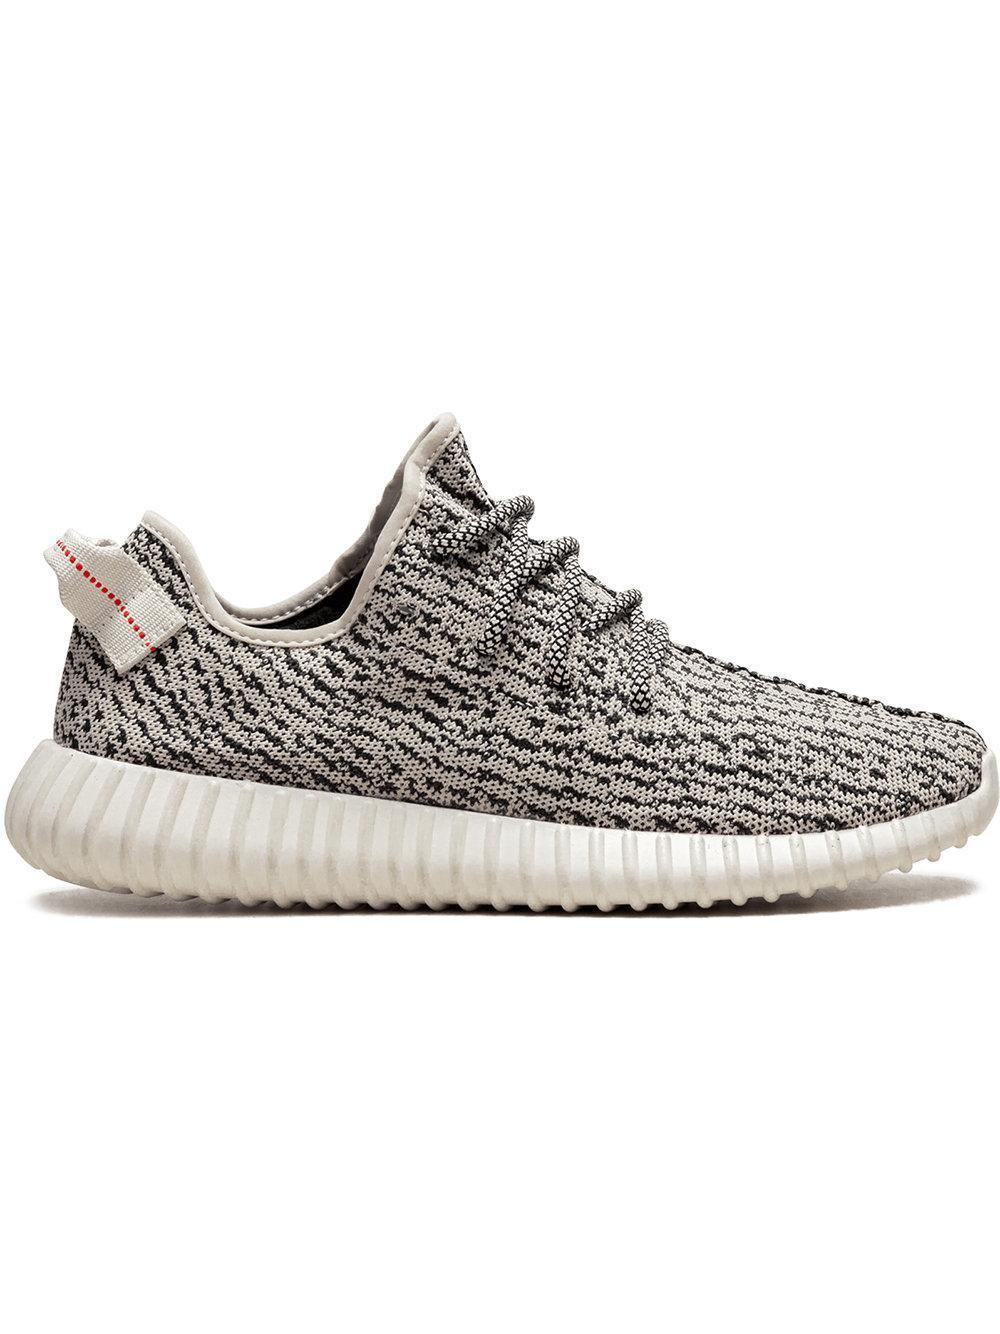 90cd04094322 Adidas Originals Adidas  Yeezy Boost 350  Sneakers - Grau In Grey ...